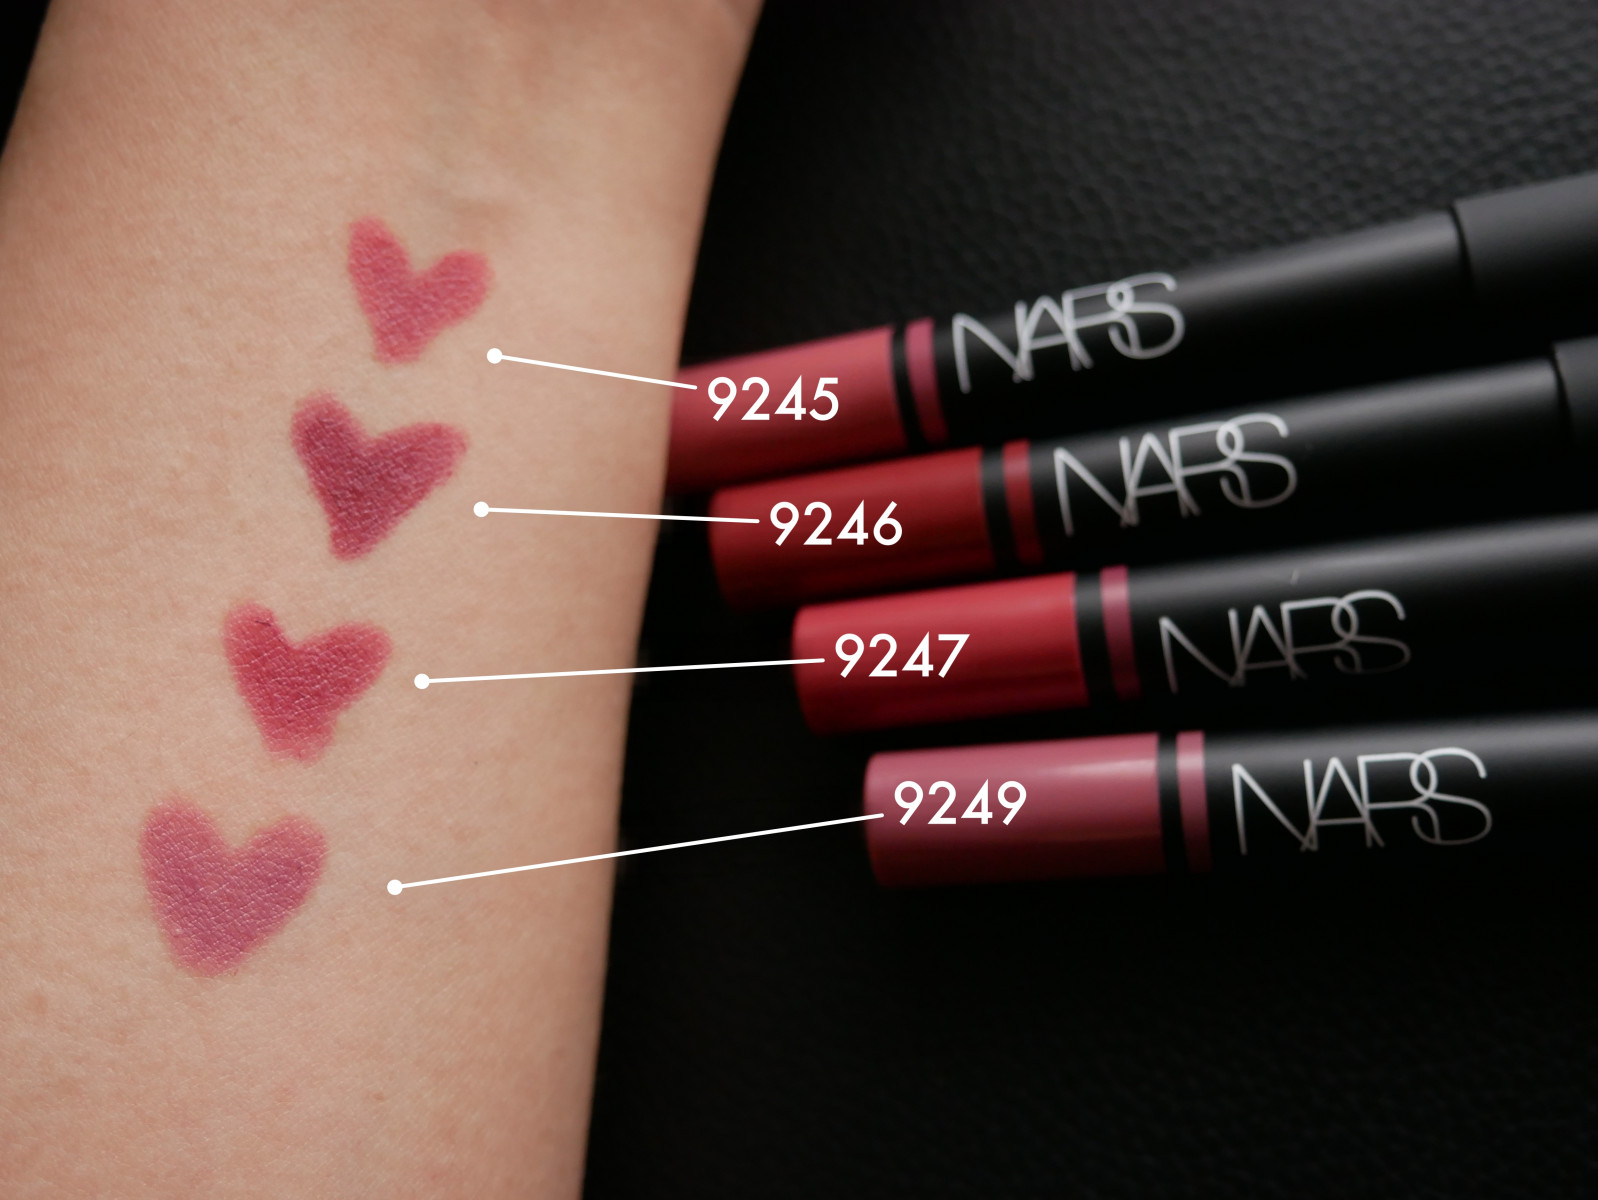 NARS 『サテンリップペンシル 』の新色が好みの色すぎて困った